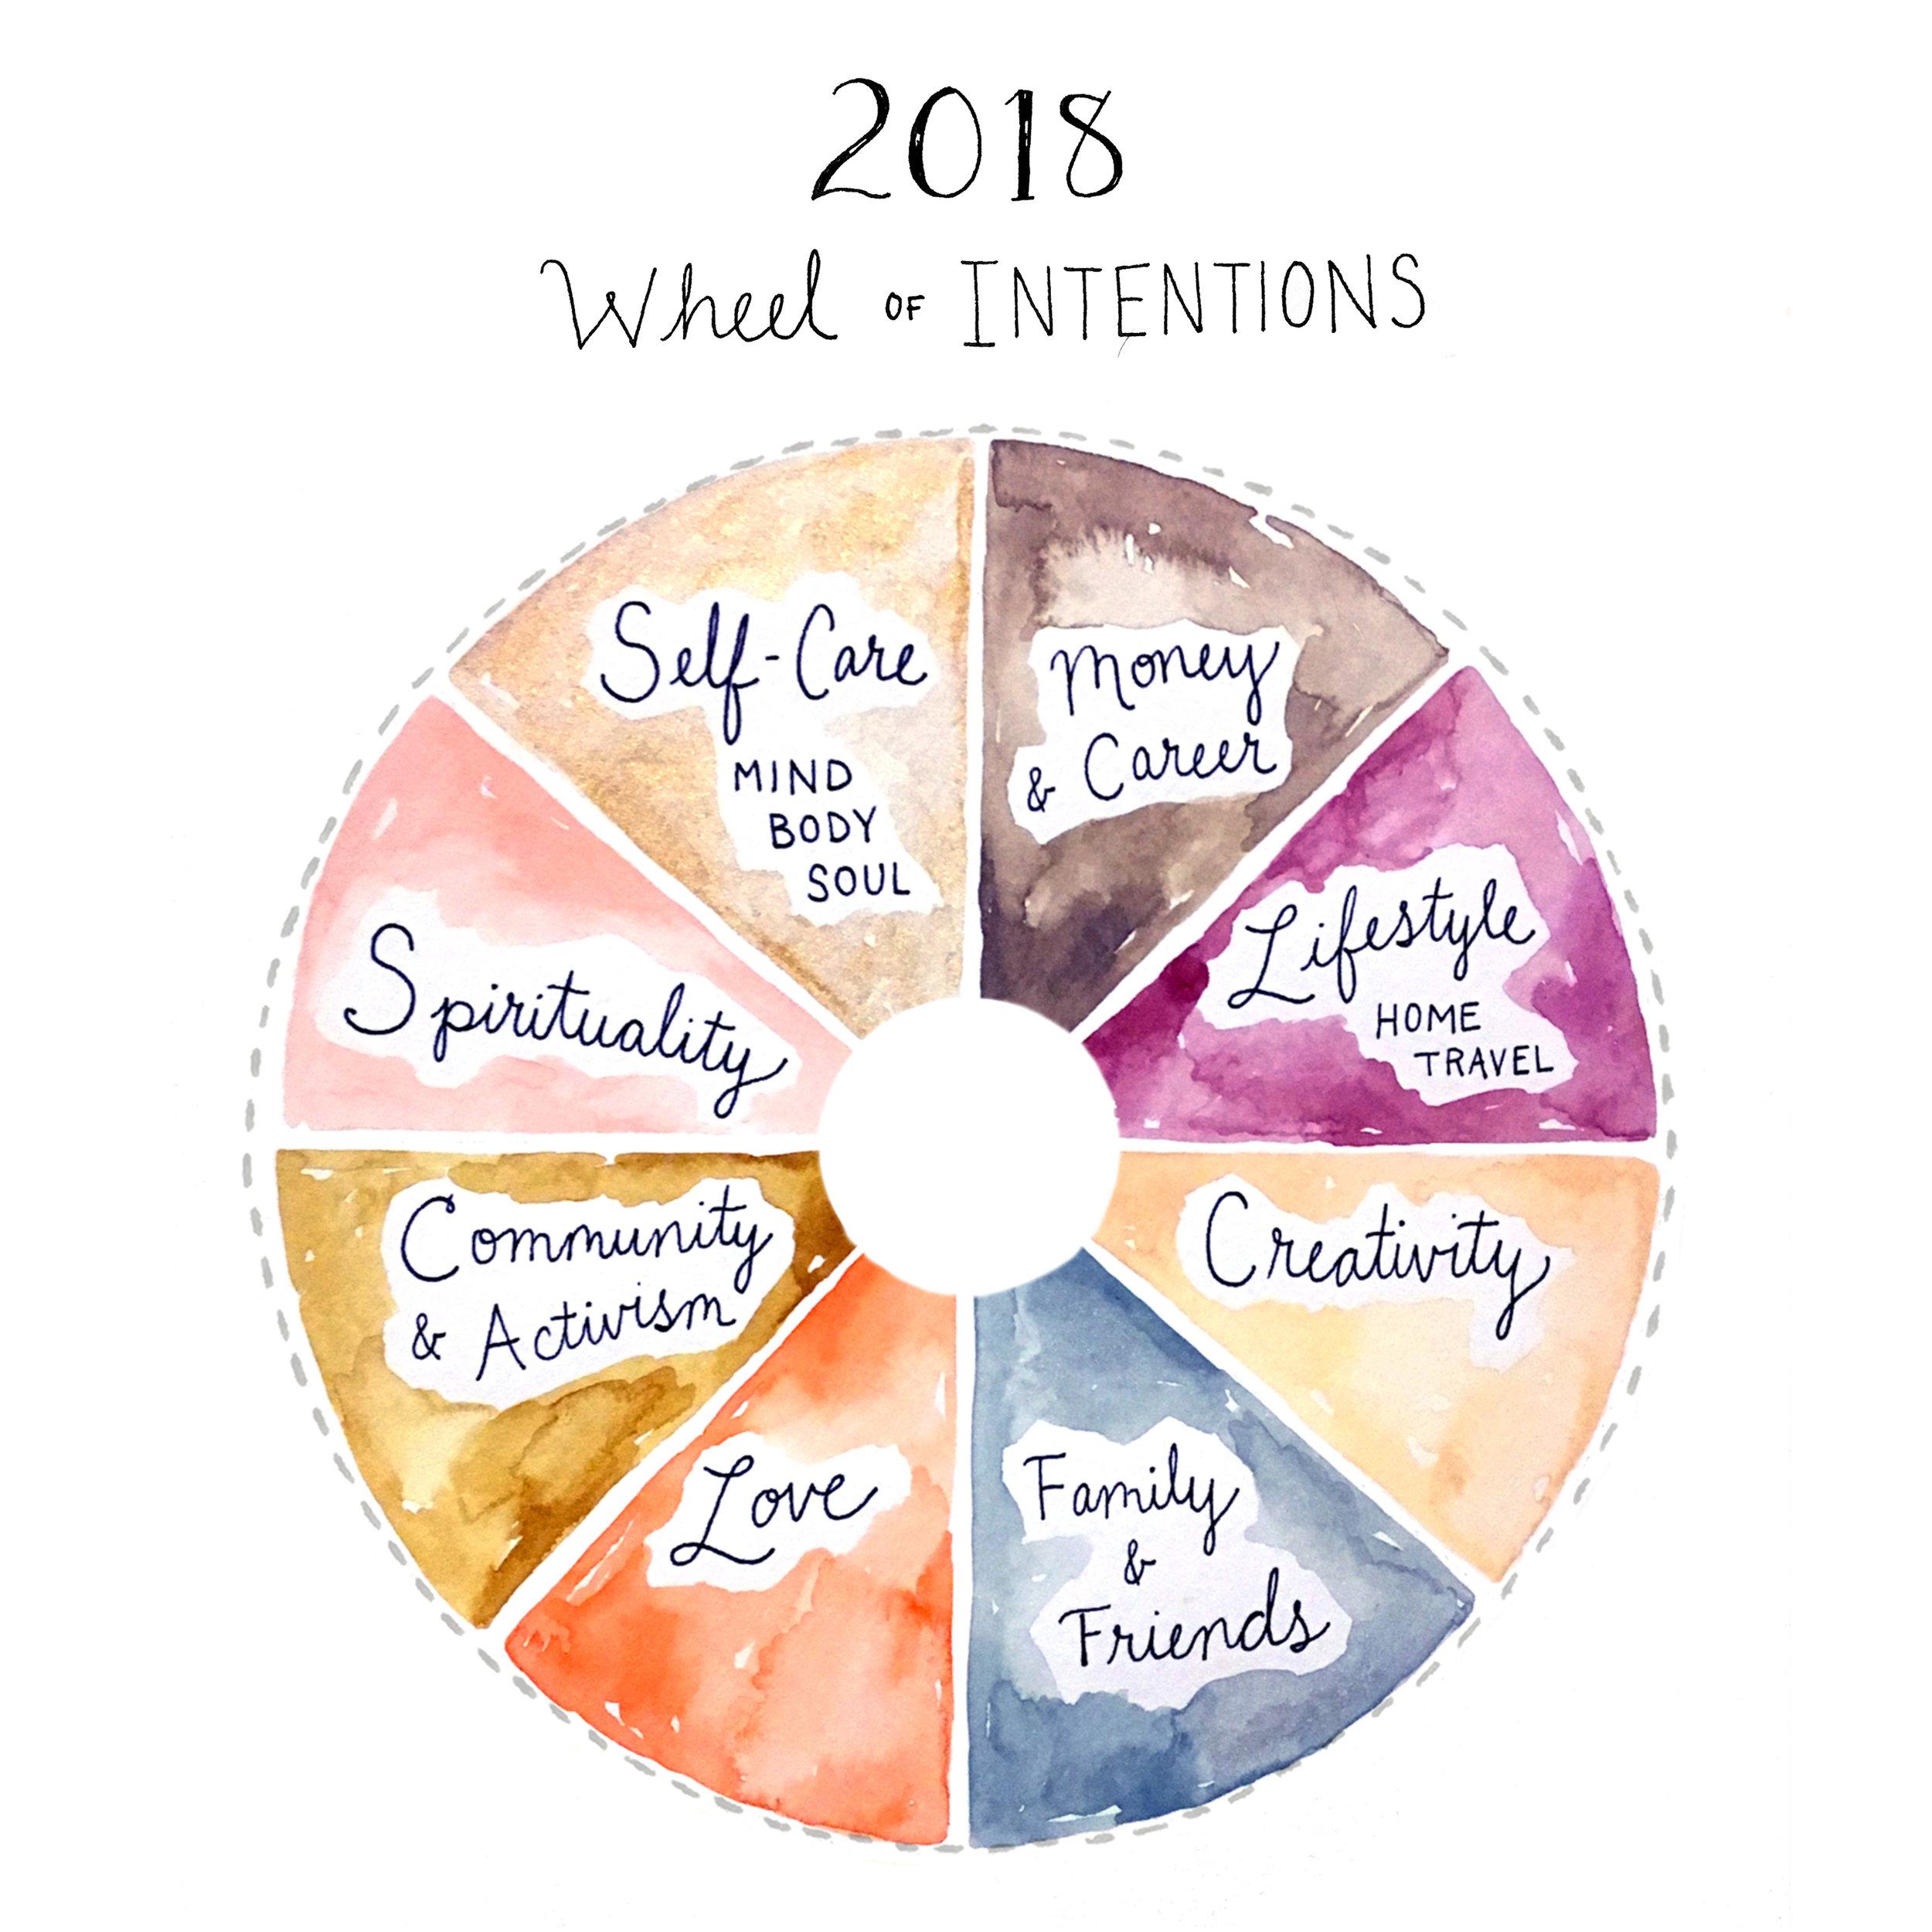 2018 Wheel of Intentions Kimothy Joy